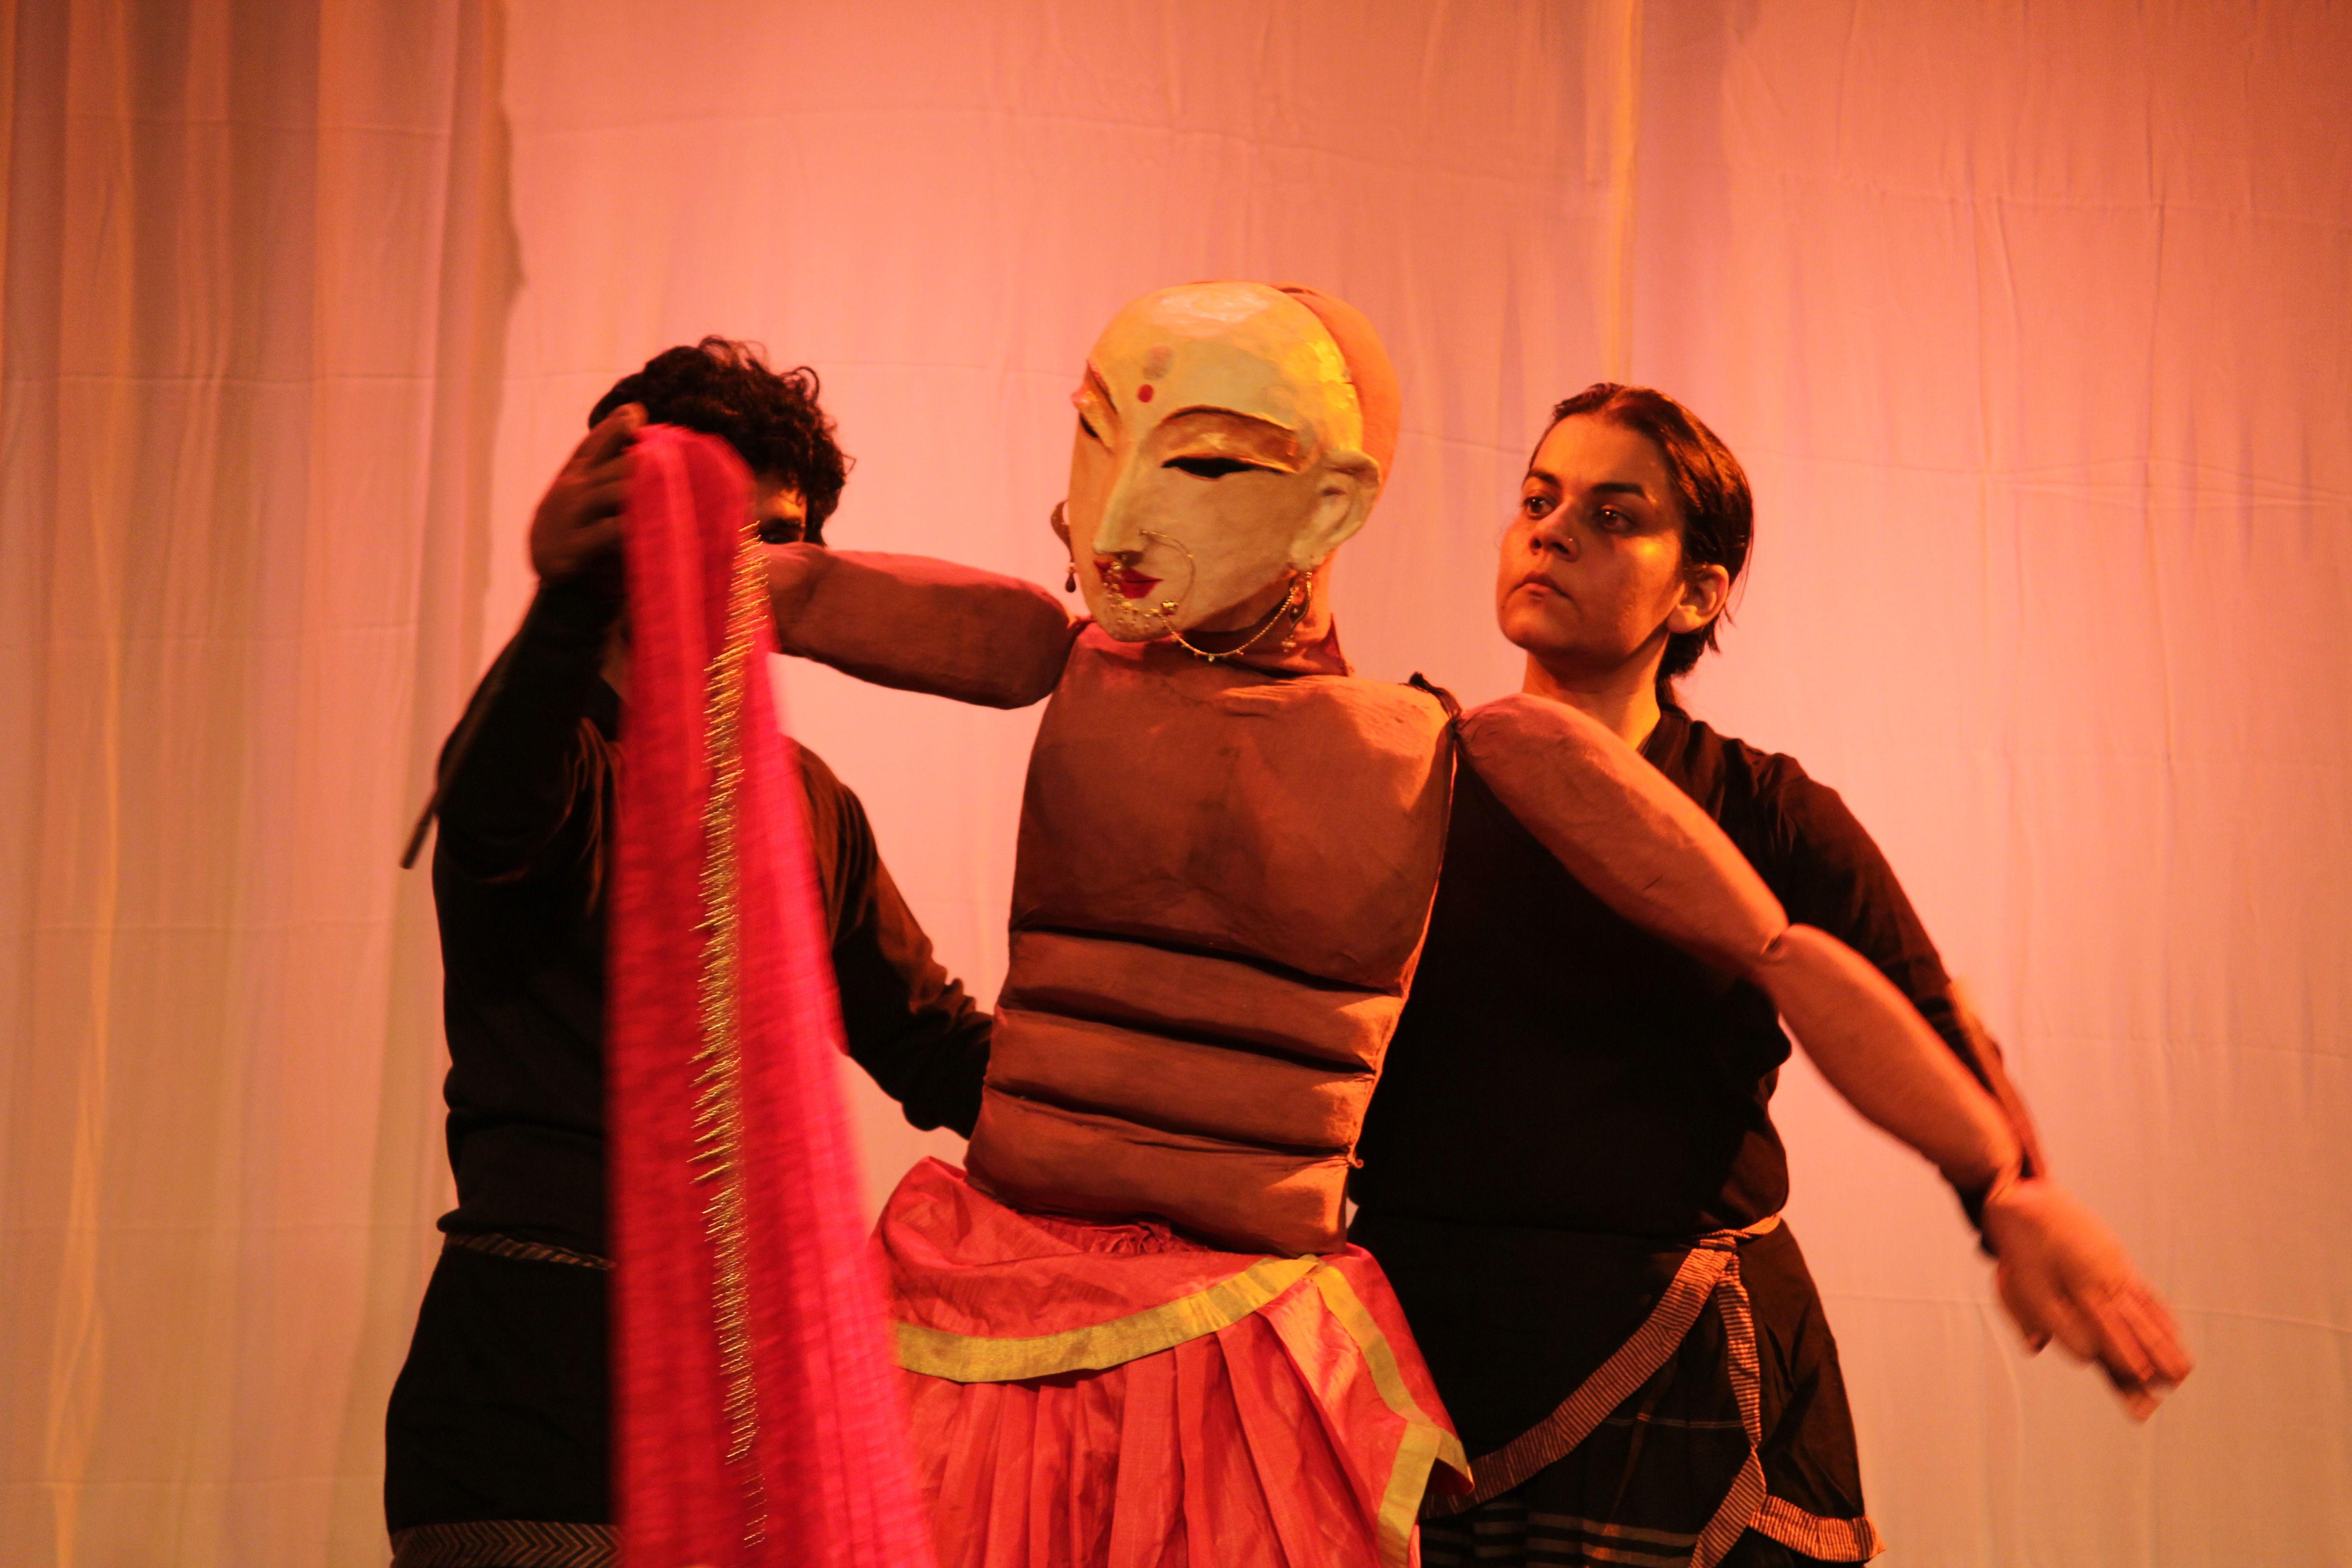 <em>Mahabharata</em> par Katkatha (New Delhi), concept et mise en scène : Anurupa Roy, marionnettistes : Mohammad Shameem, Vivek Kumar, Anurupa Roy, Avinash Kumar, Gunduraju. Grande marionnette à tiges